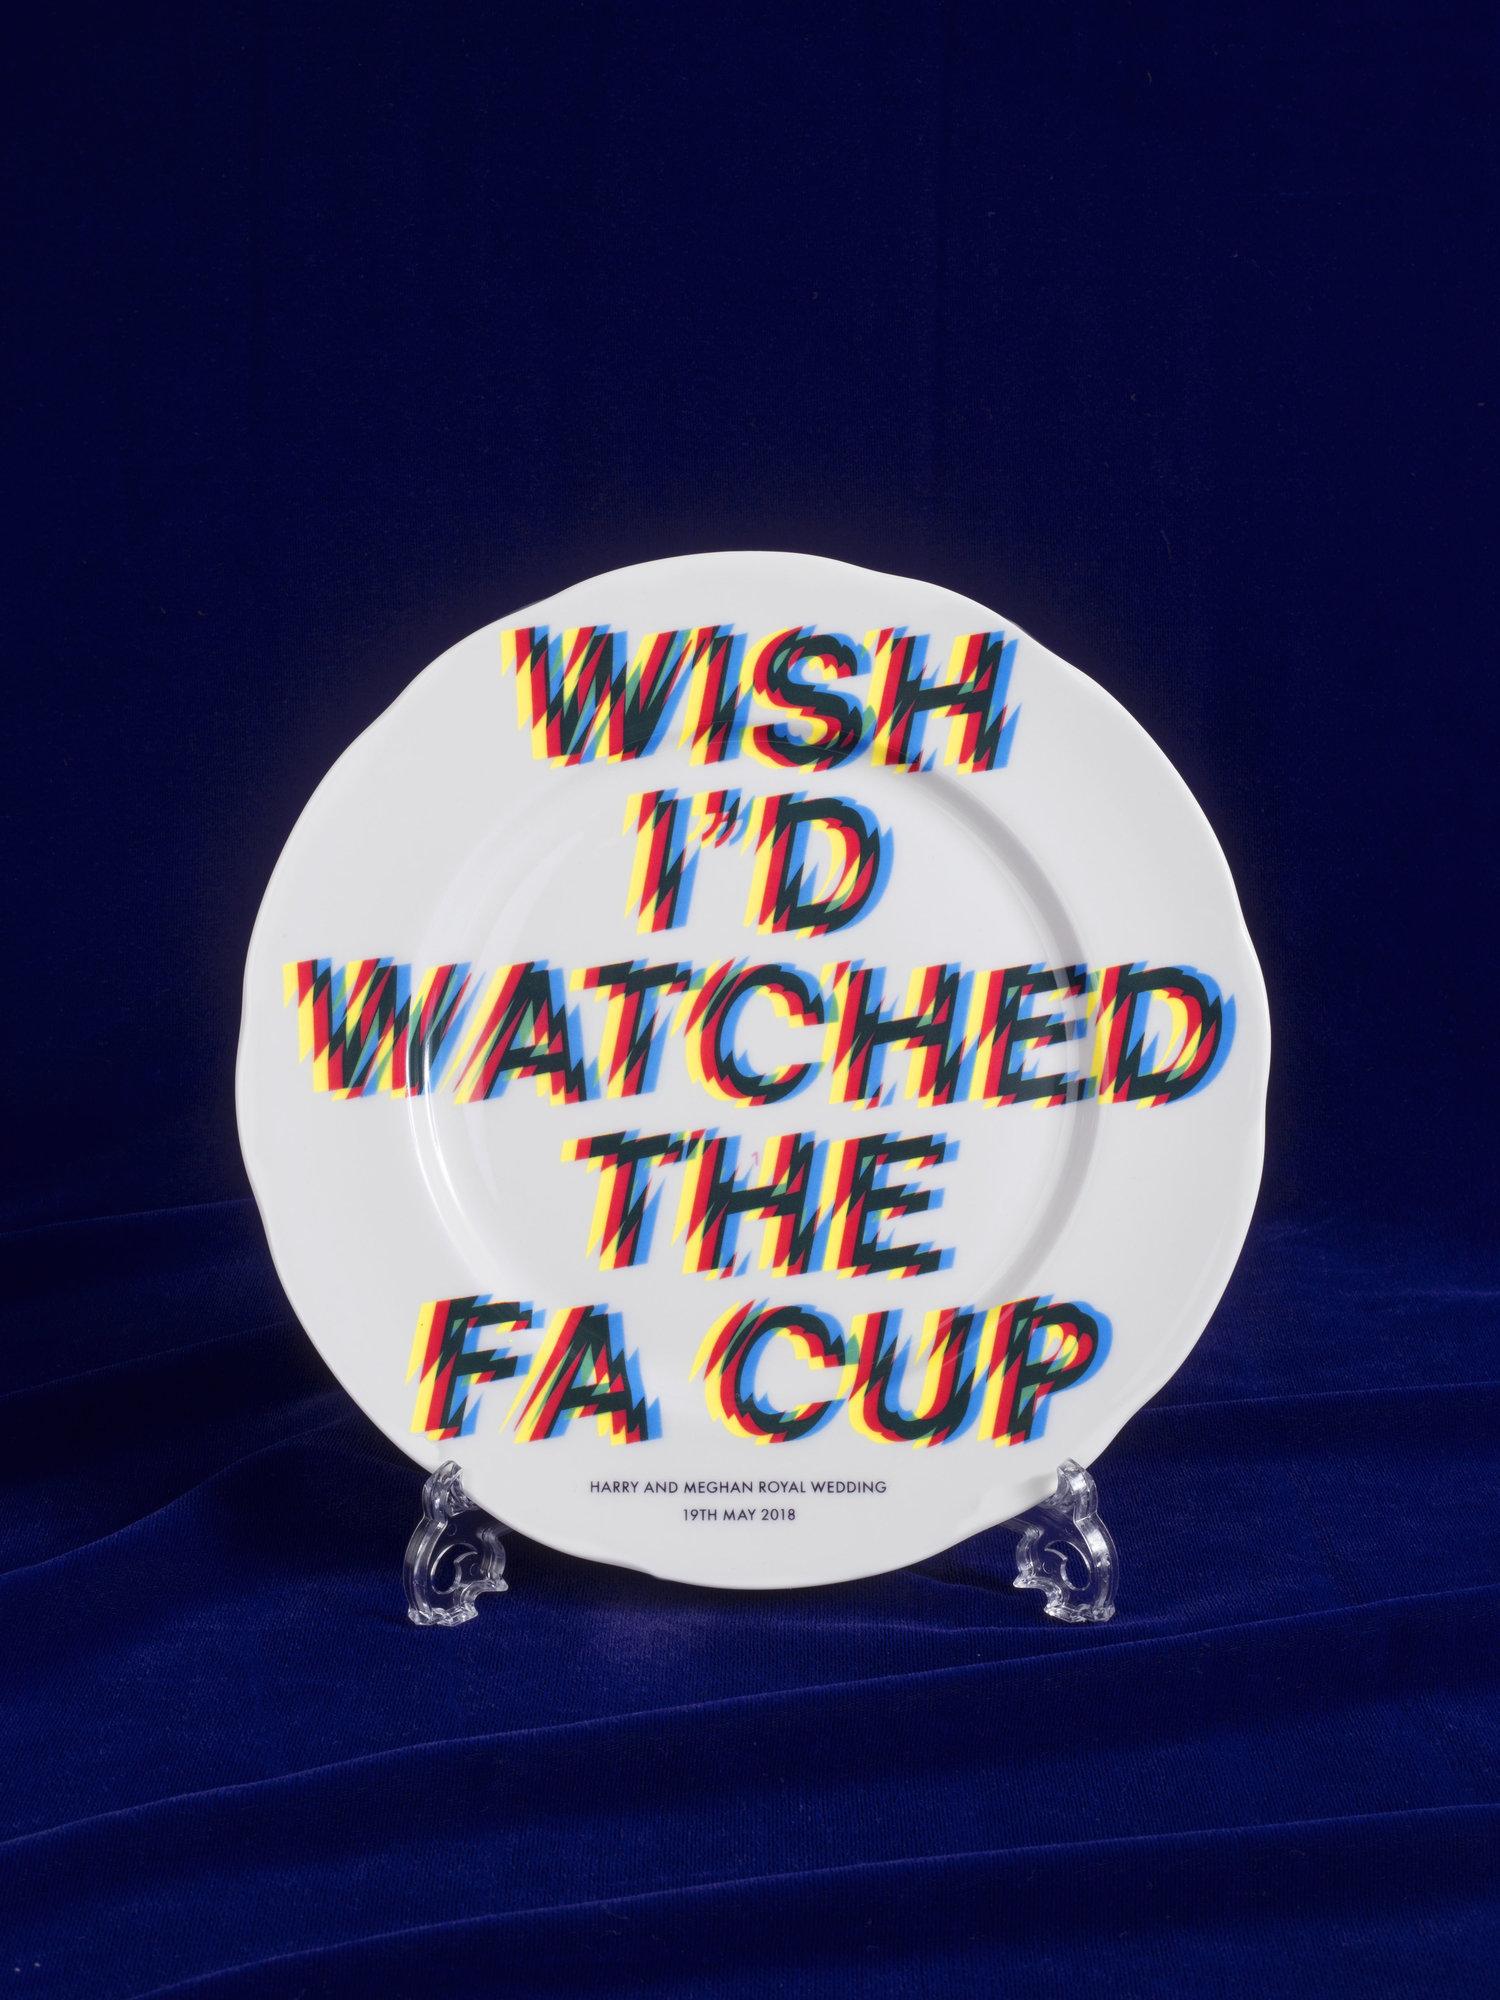 harry meghan wedding souvenir fa cup.jpg